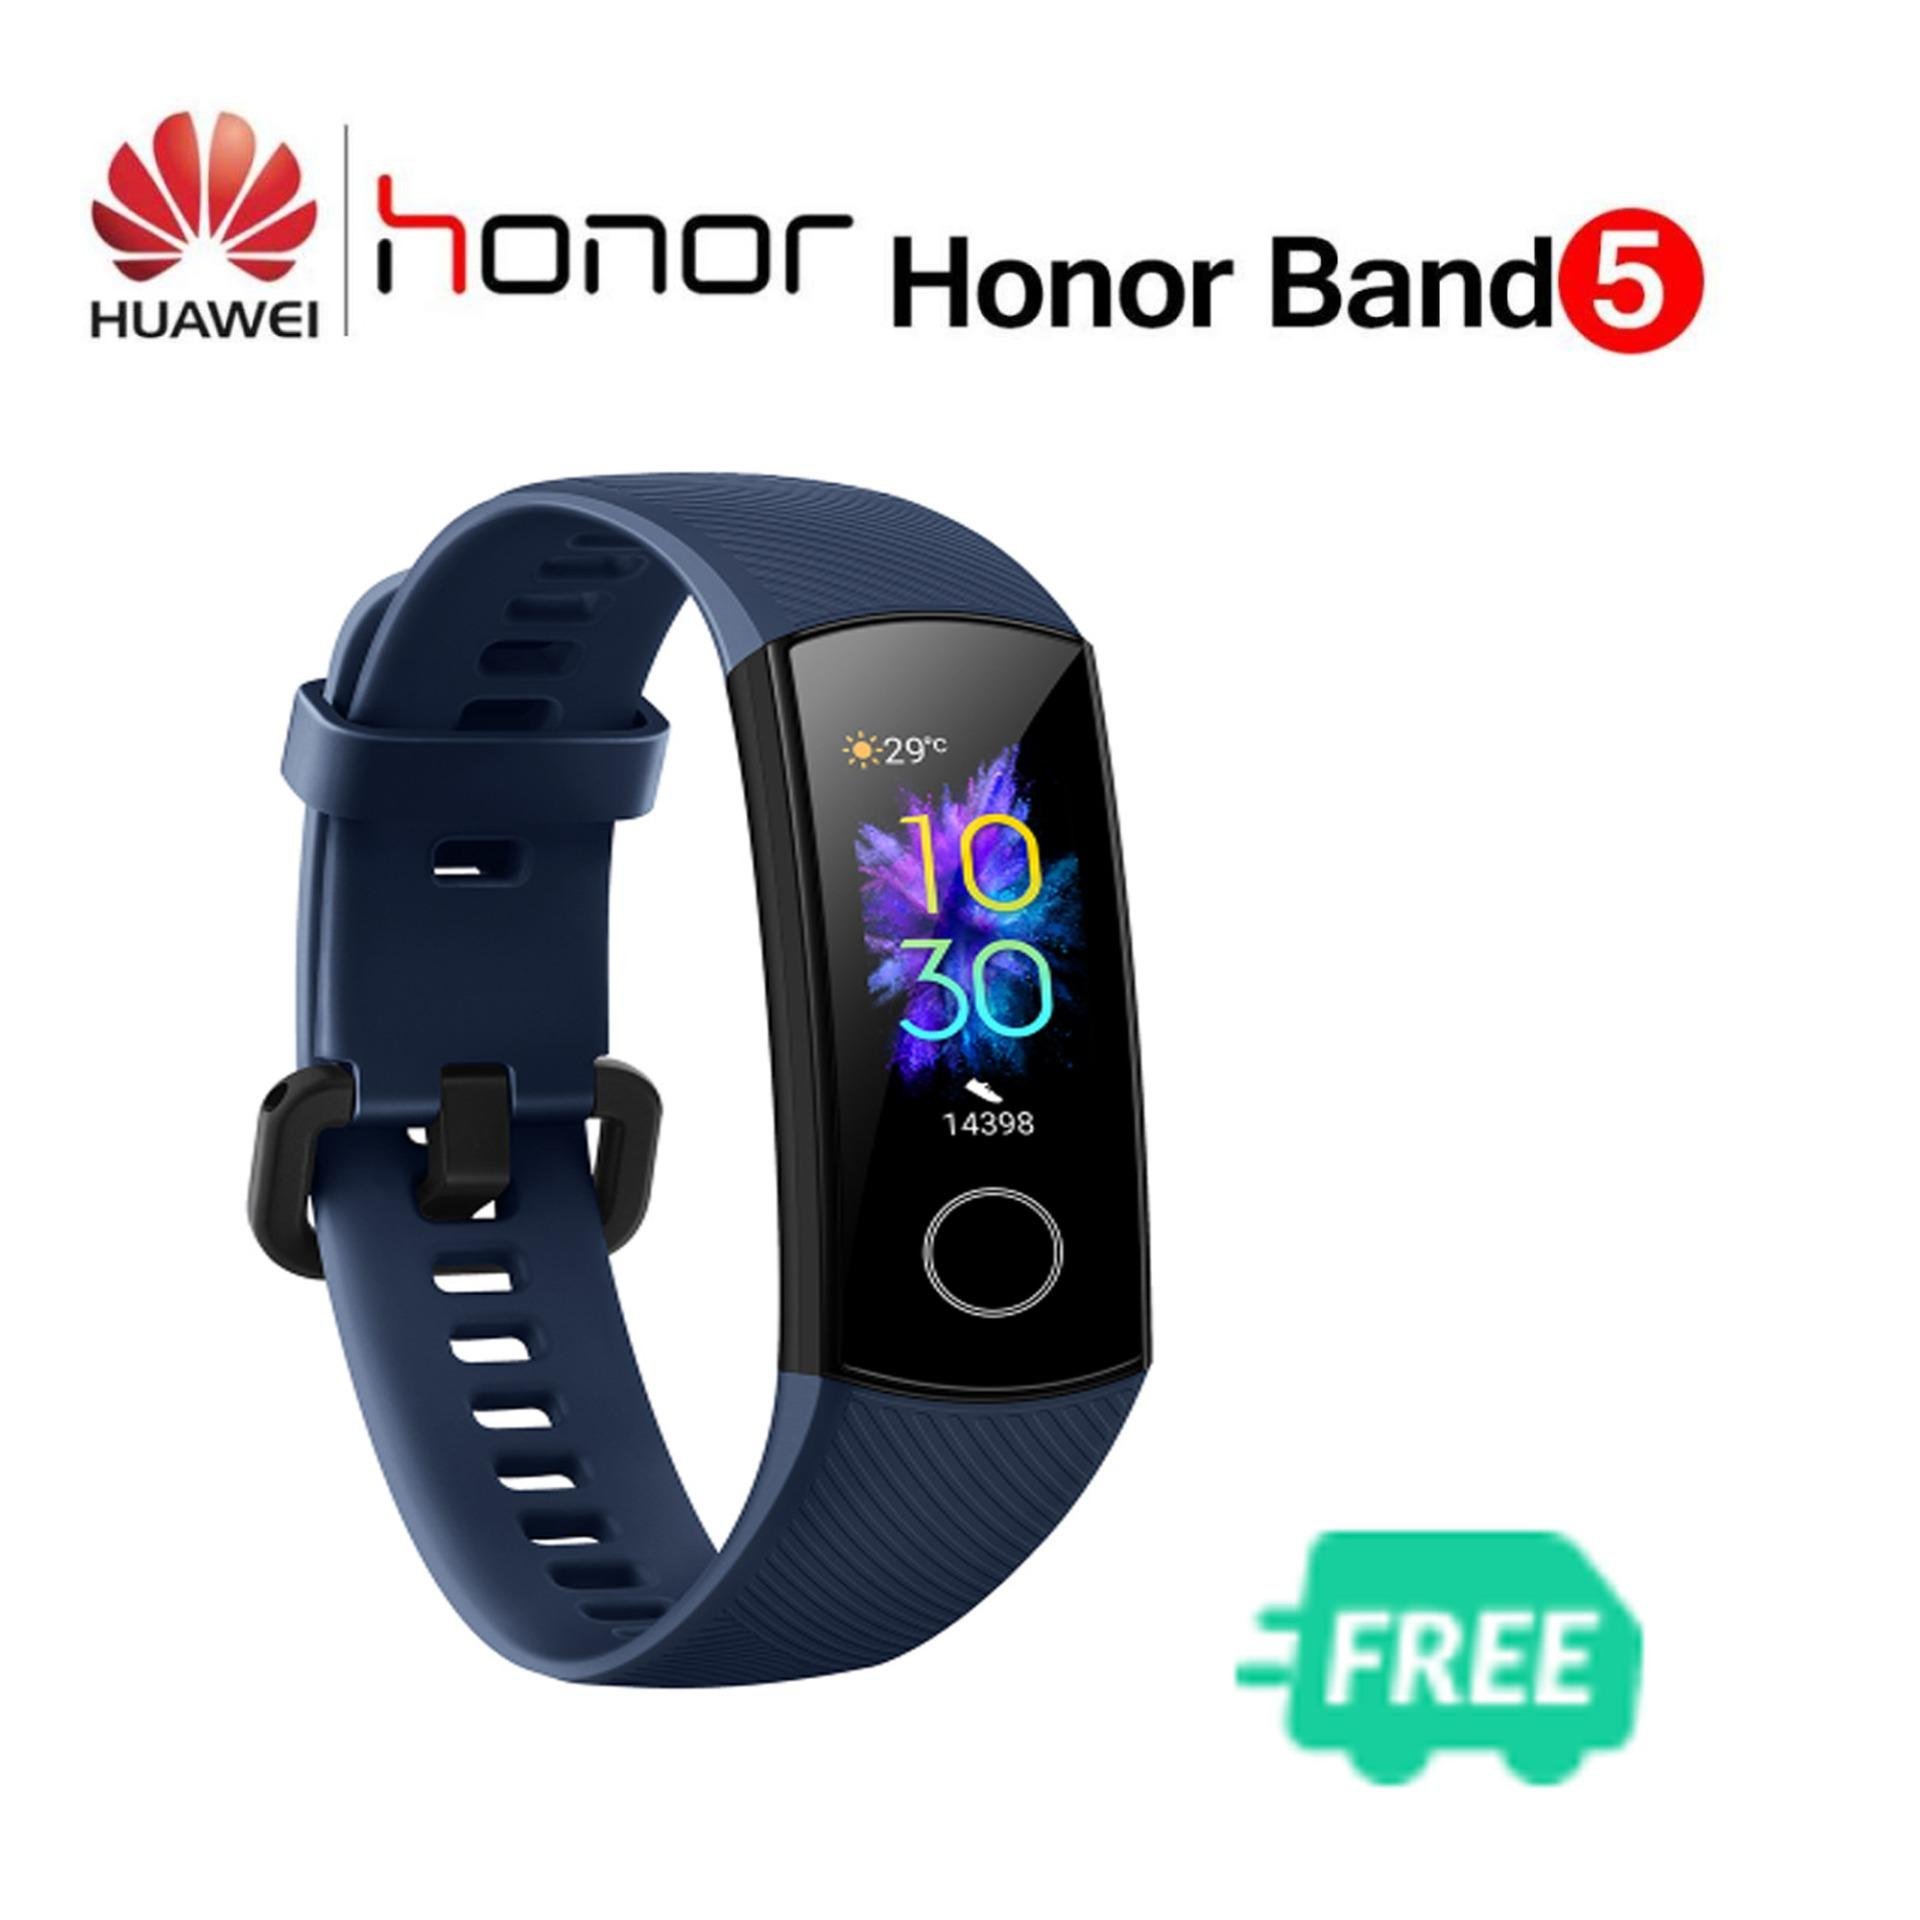 (Free Shipping Fee+Free gift) Original Honor Band 5 Fitness Smart Bracelet